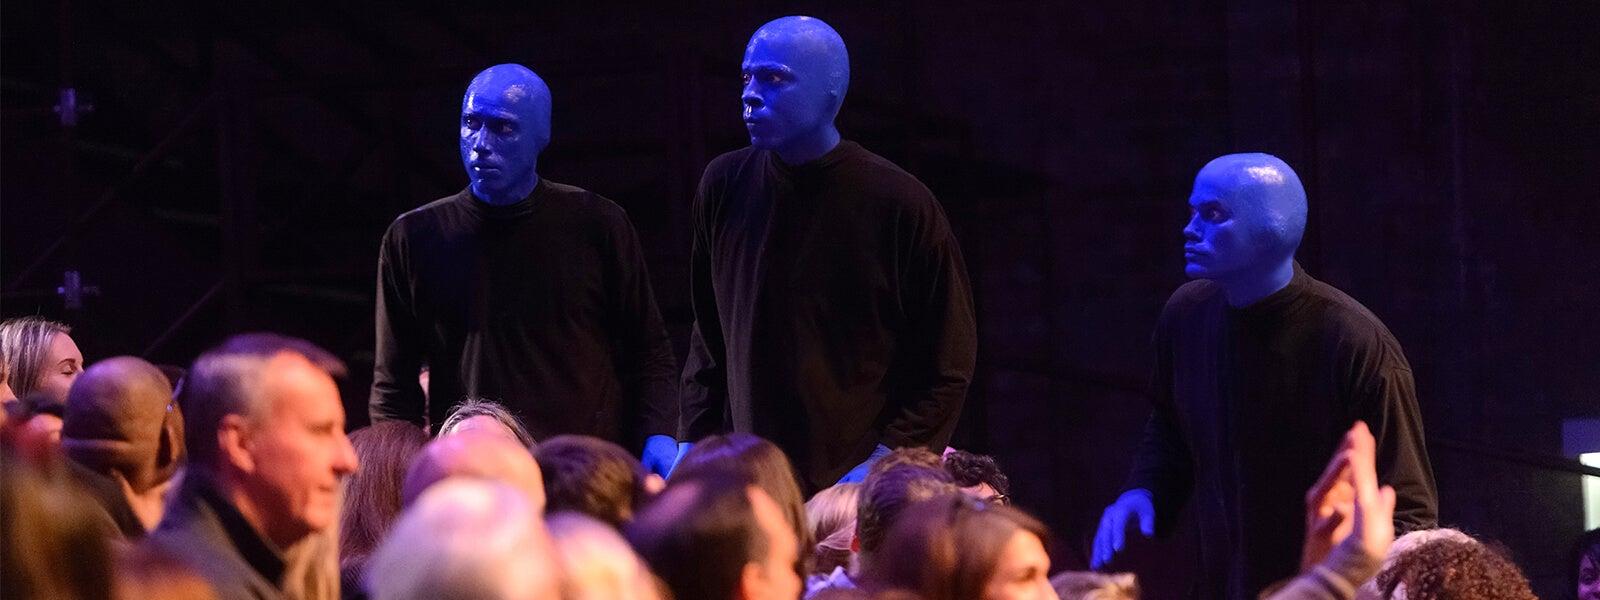 Blue-Man-Group_1600x600_2_NEW.jpg